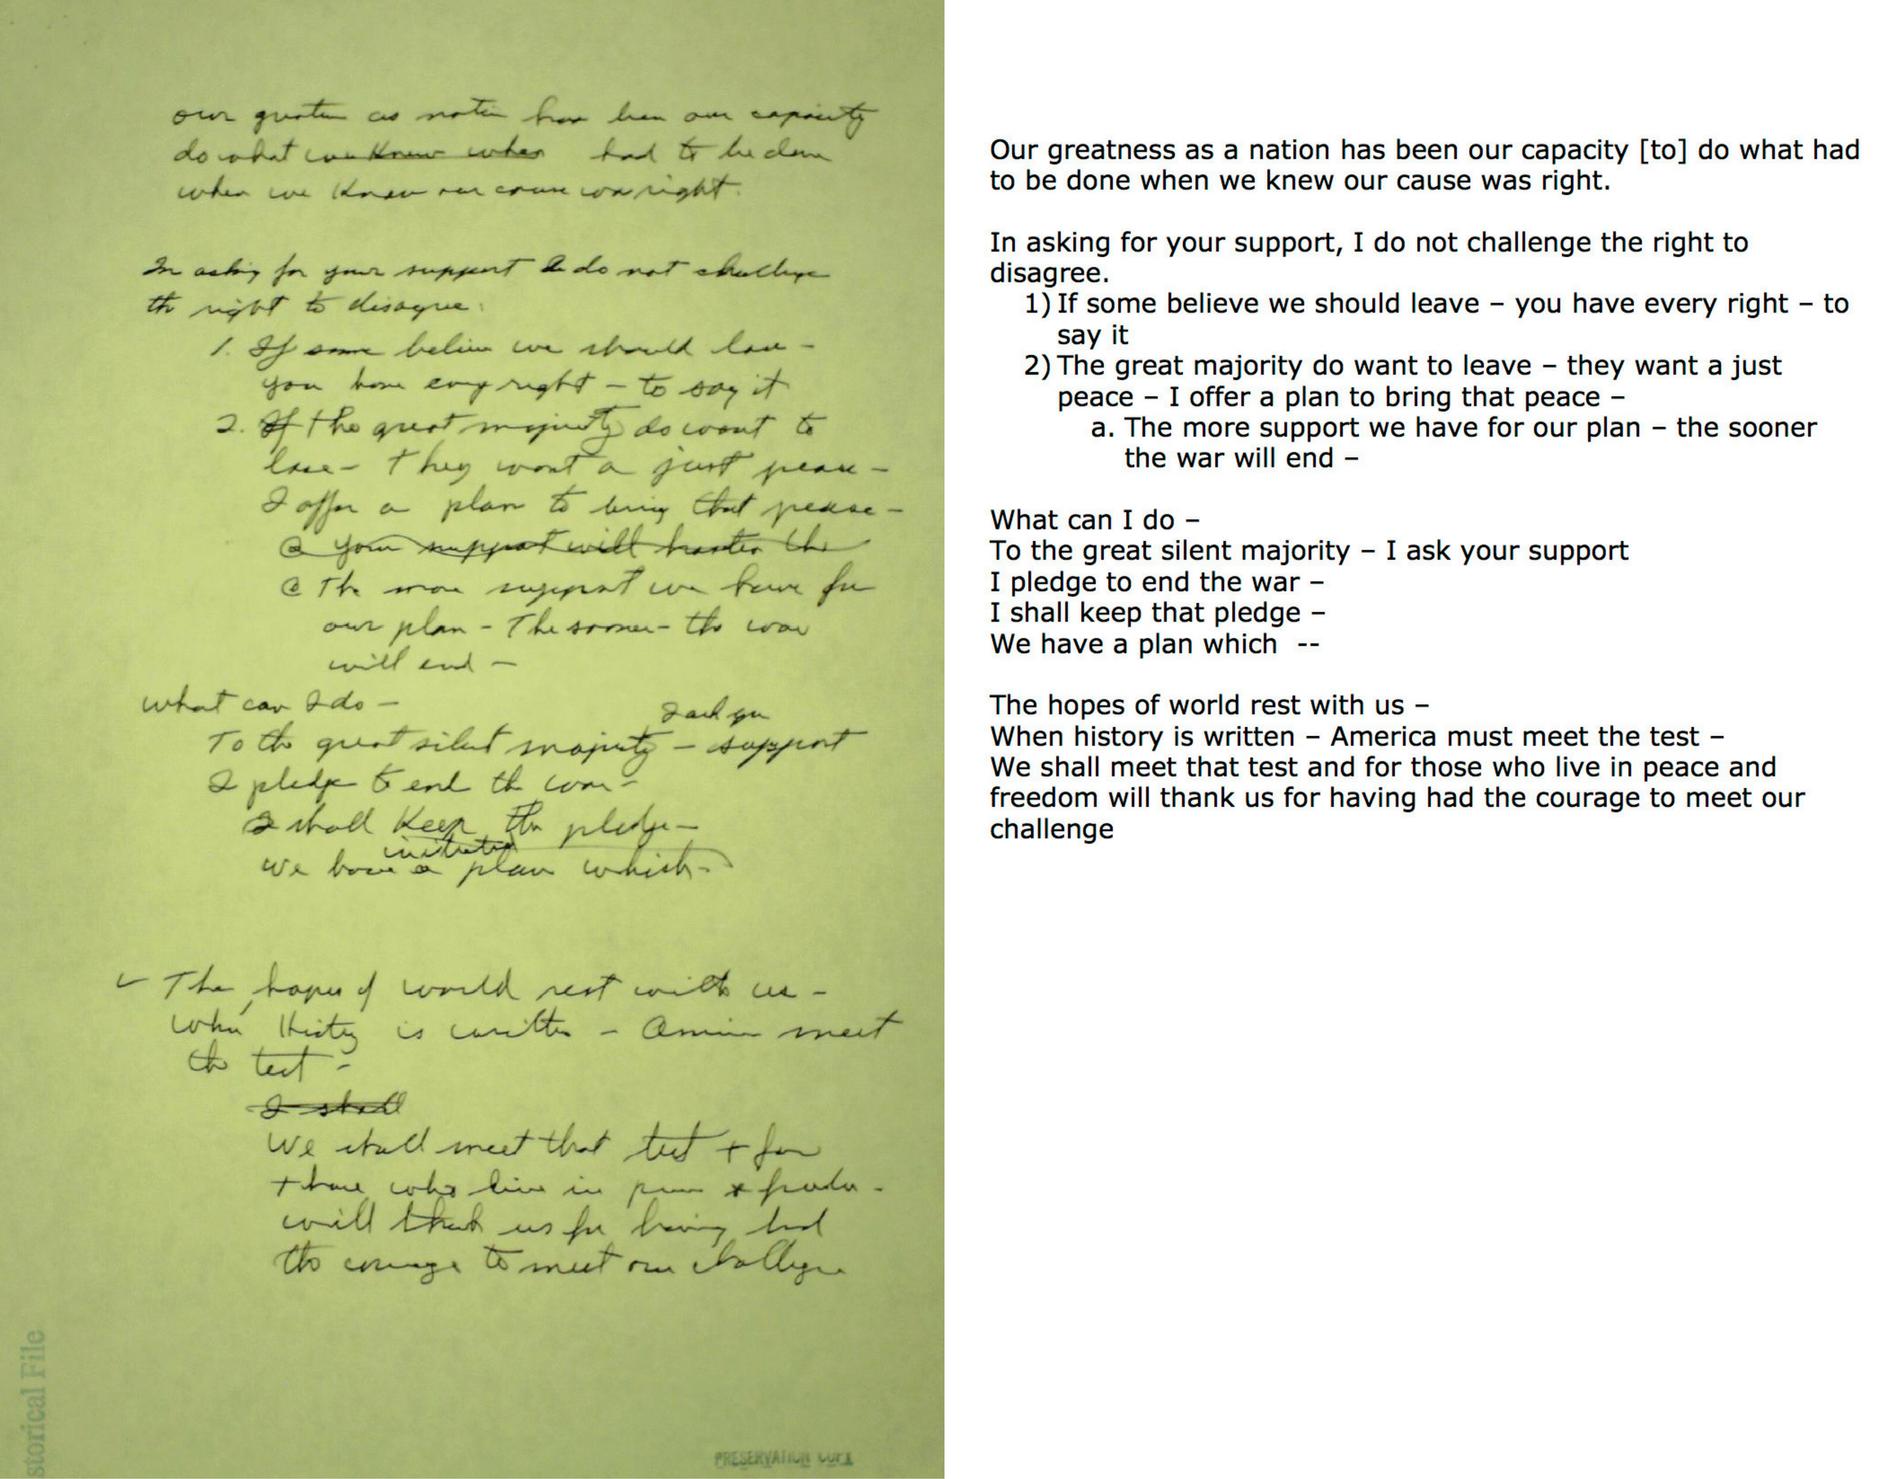 Sample Handwritten Thank You Letter After Interview